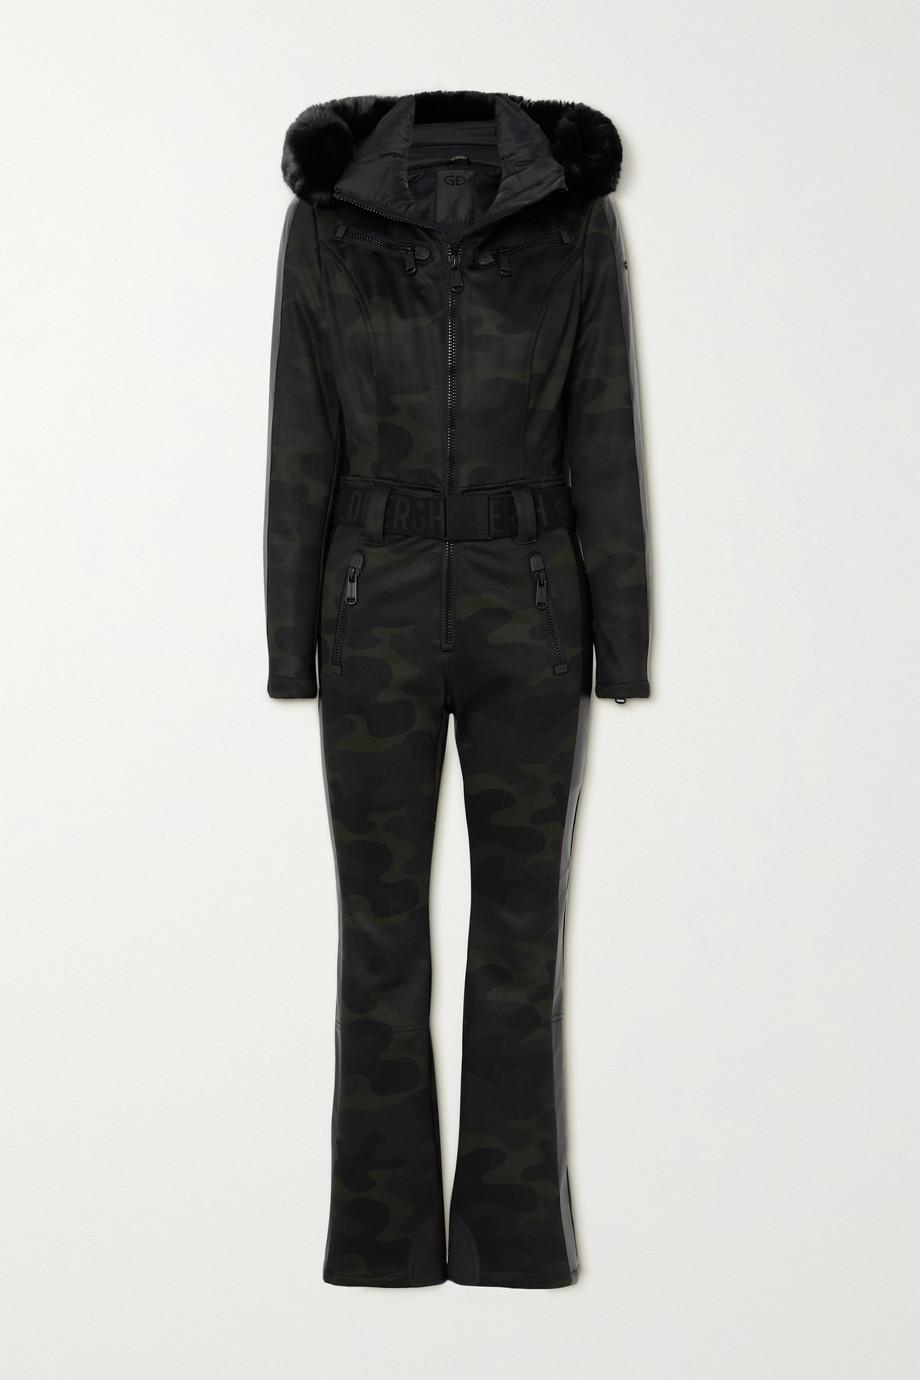 Goldbergh Bush faux fur-trimmed belted camouflage-print down ski suit